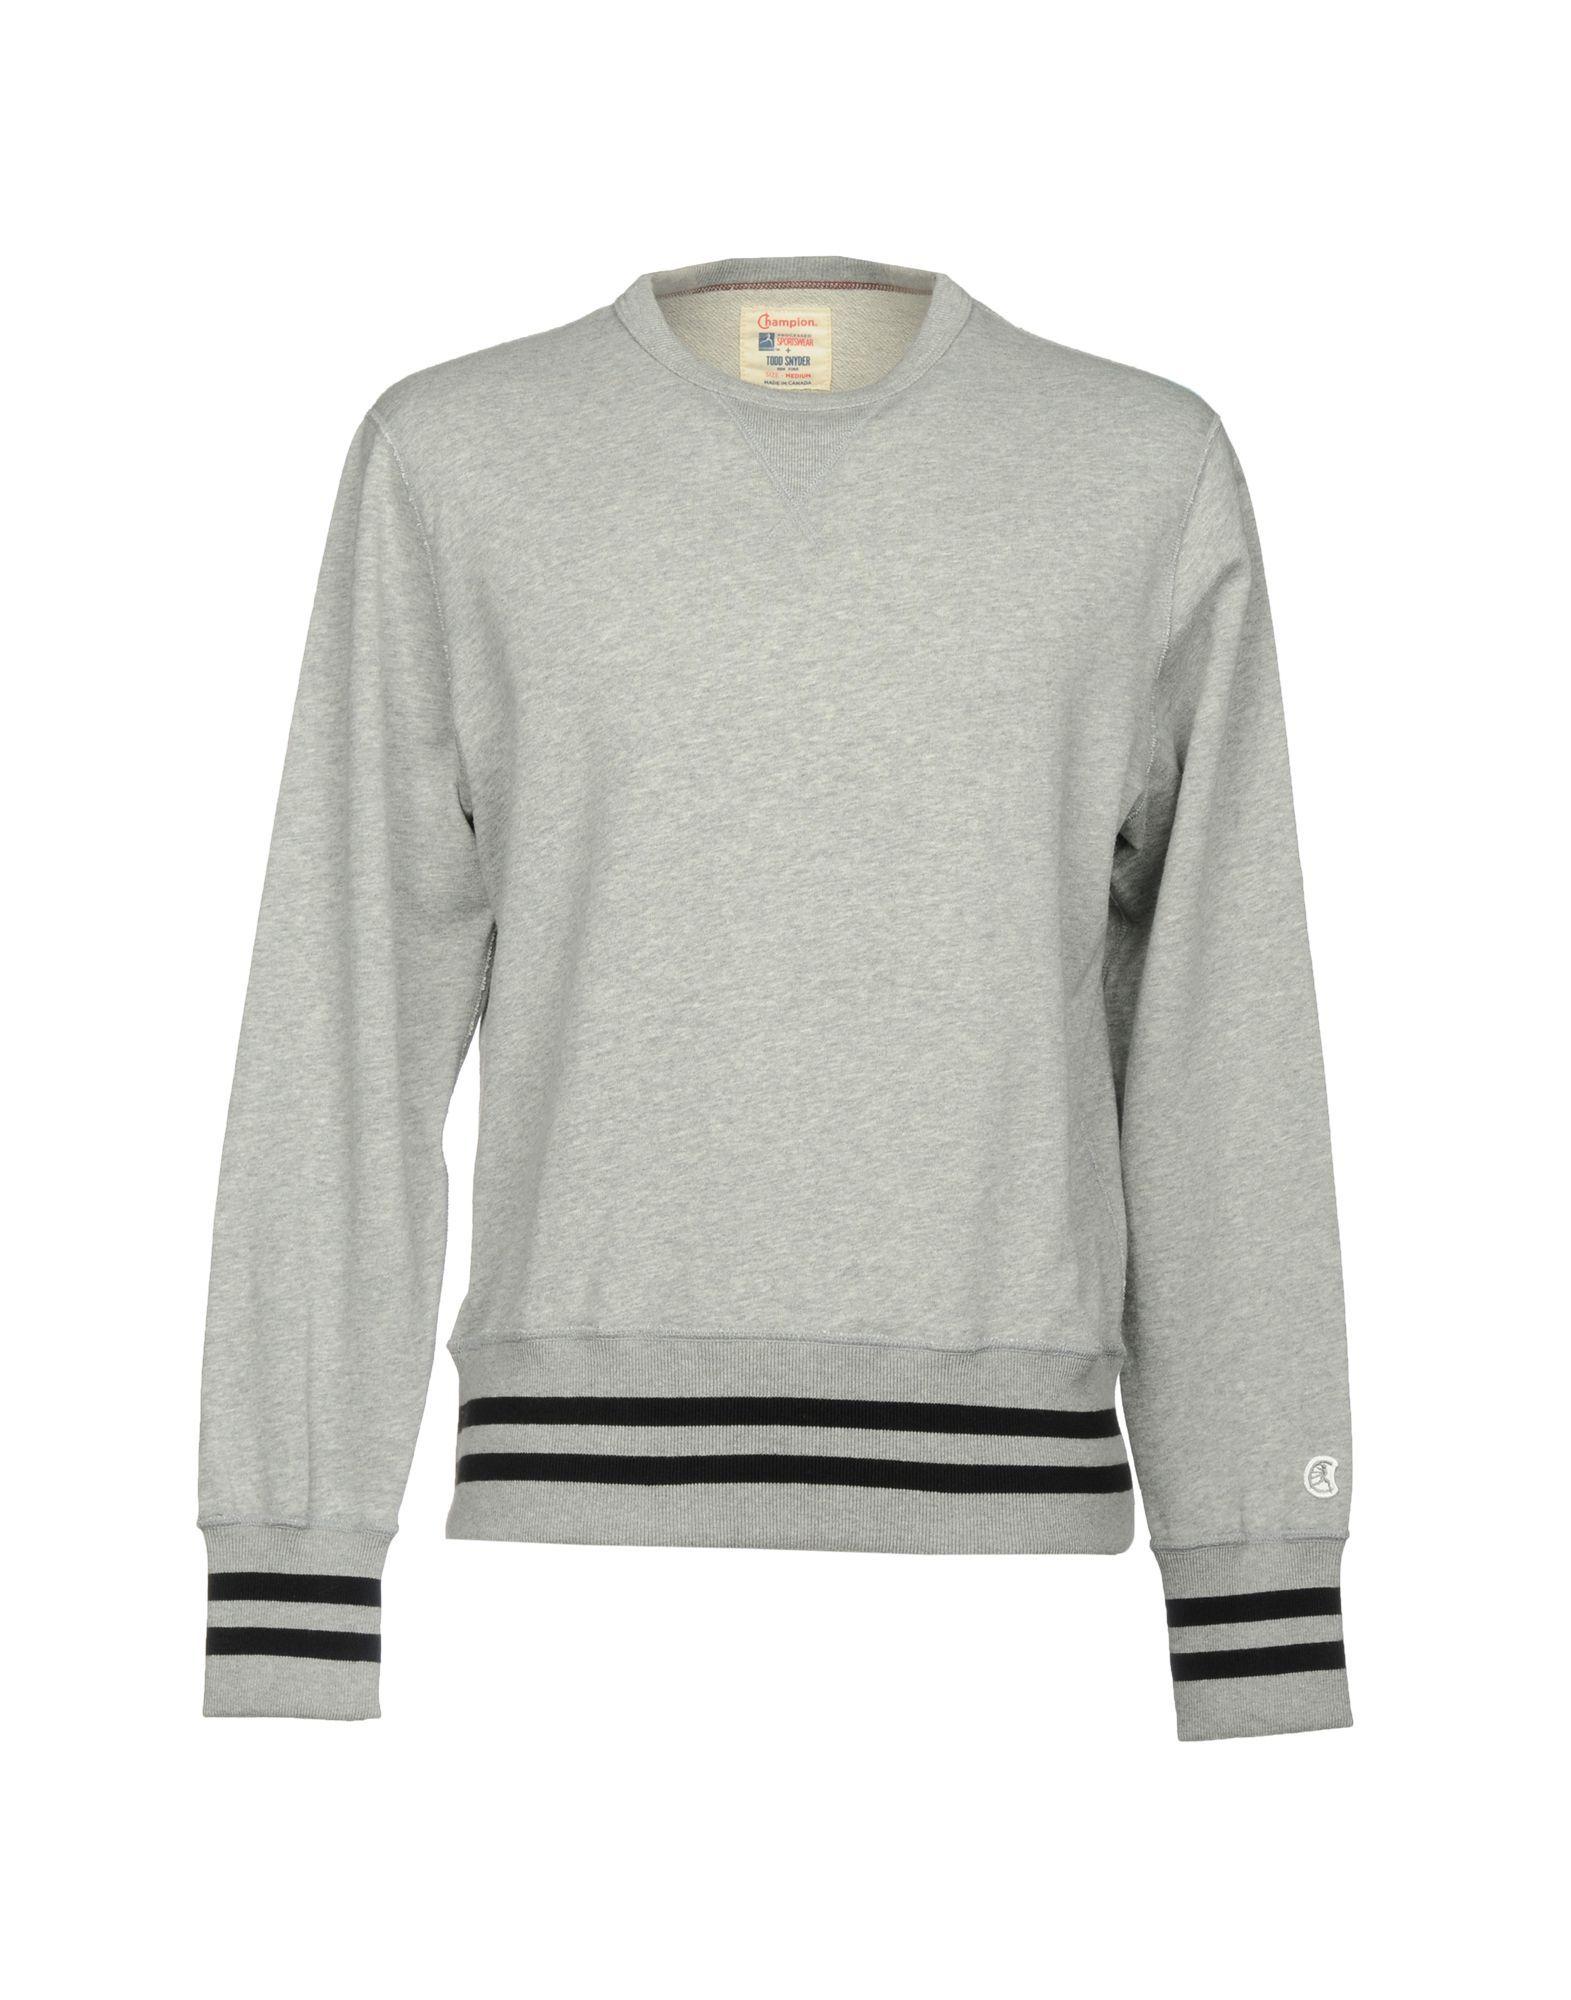 Champion Sweatshirts In Light Grey Modesens Champion Sweatshirt Sweatshirts Champion [ 2000 x 1571 Pixel ]